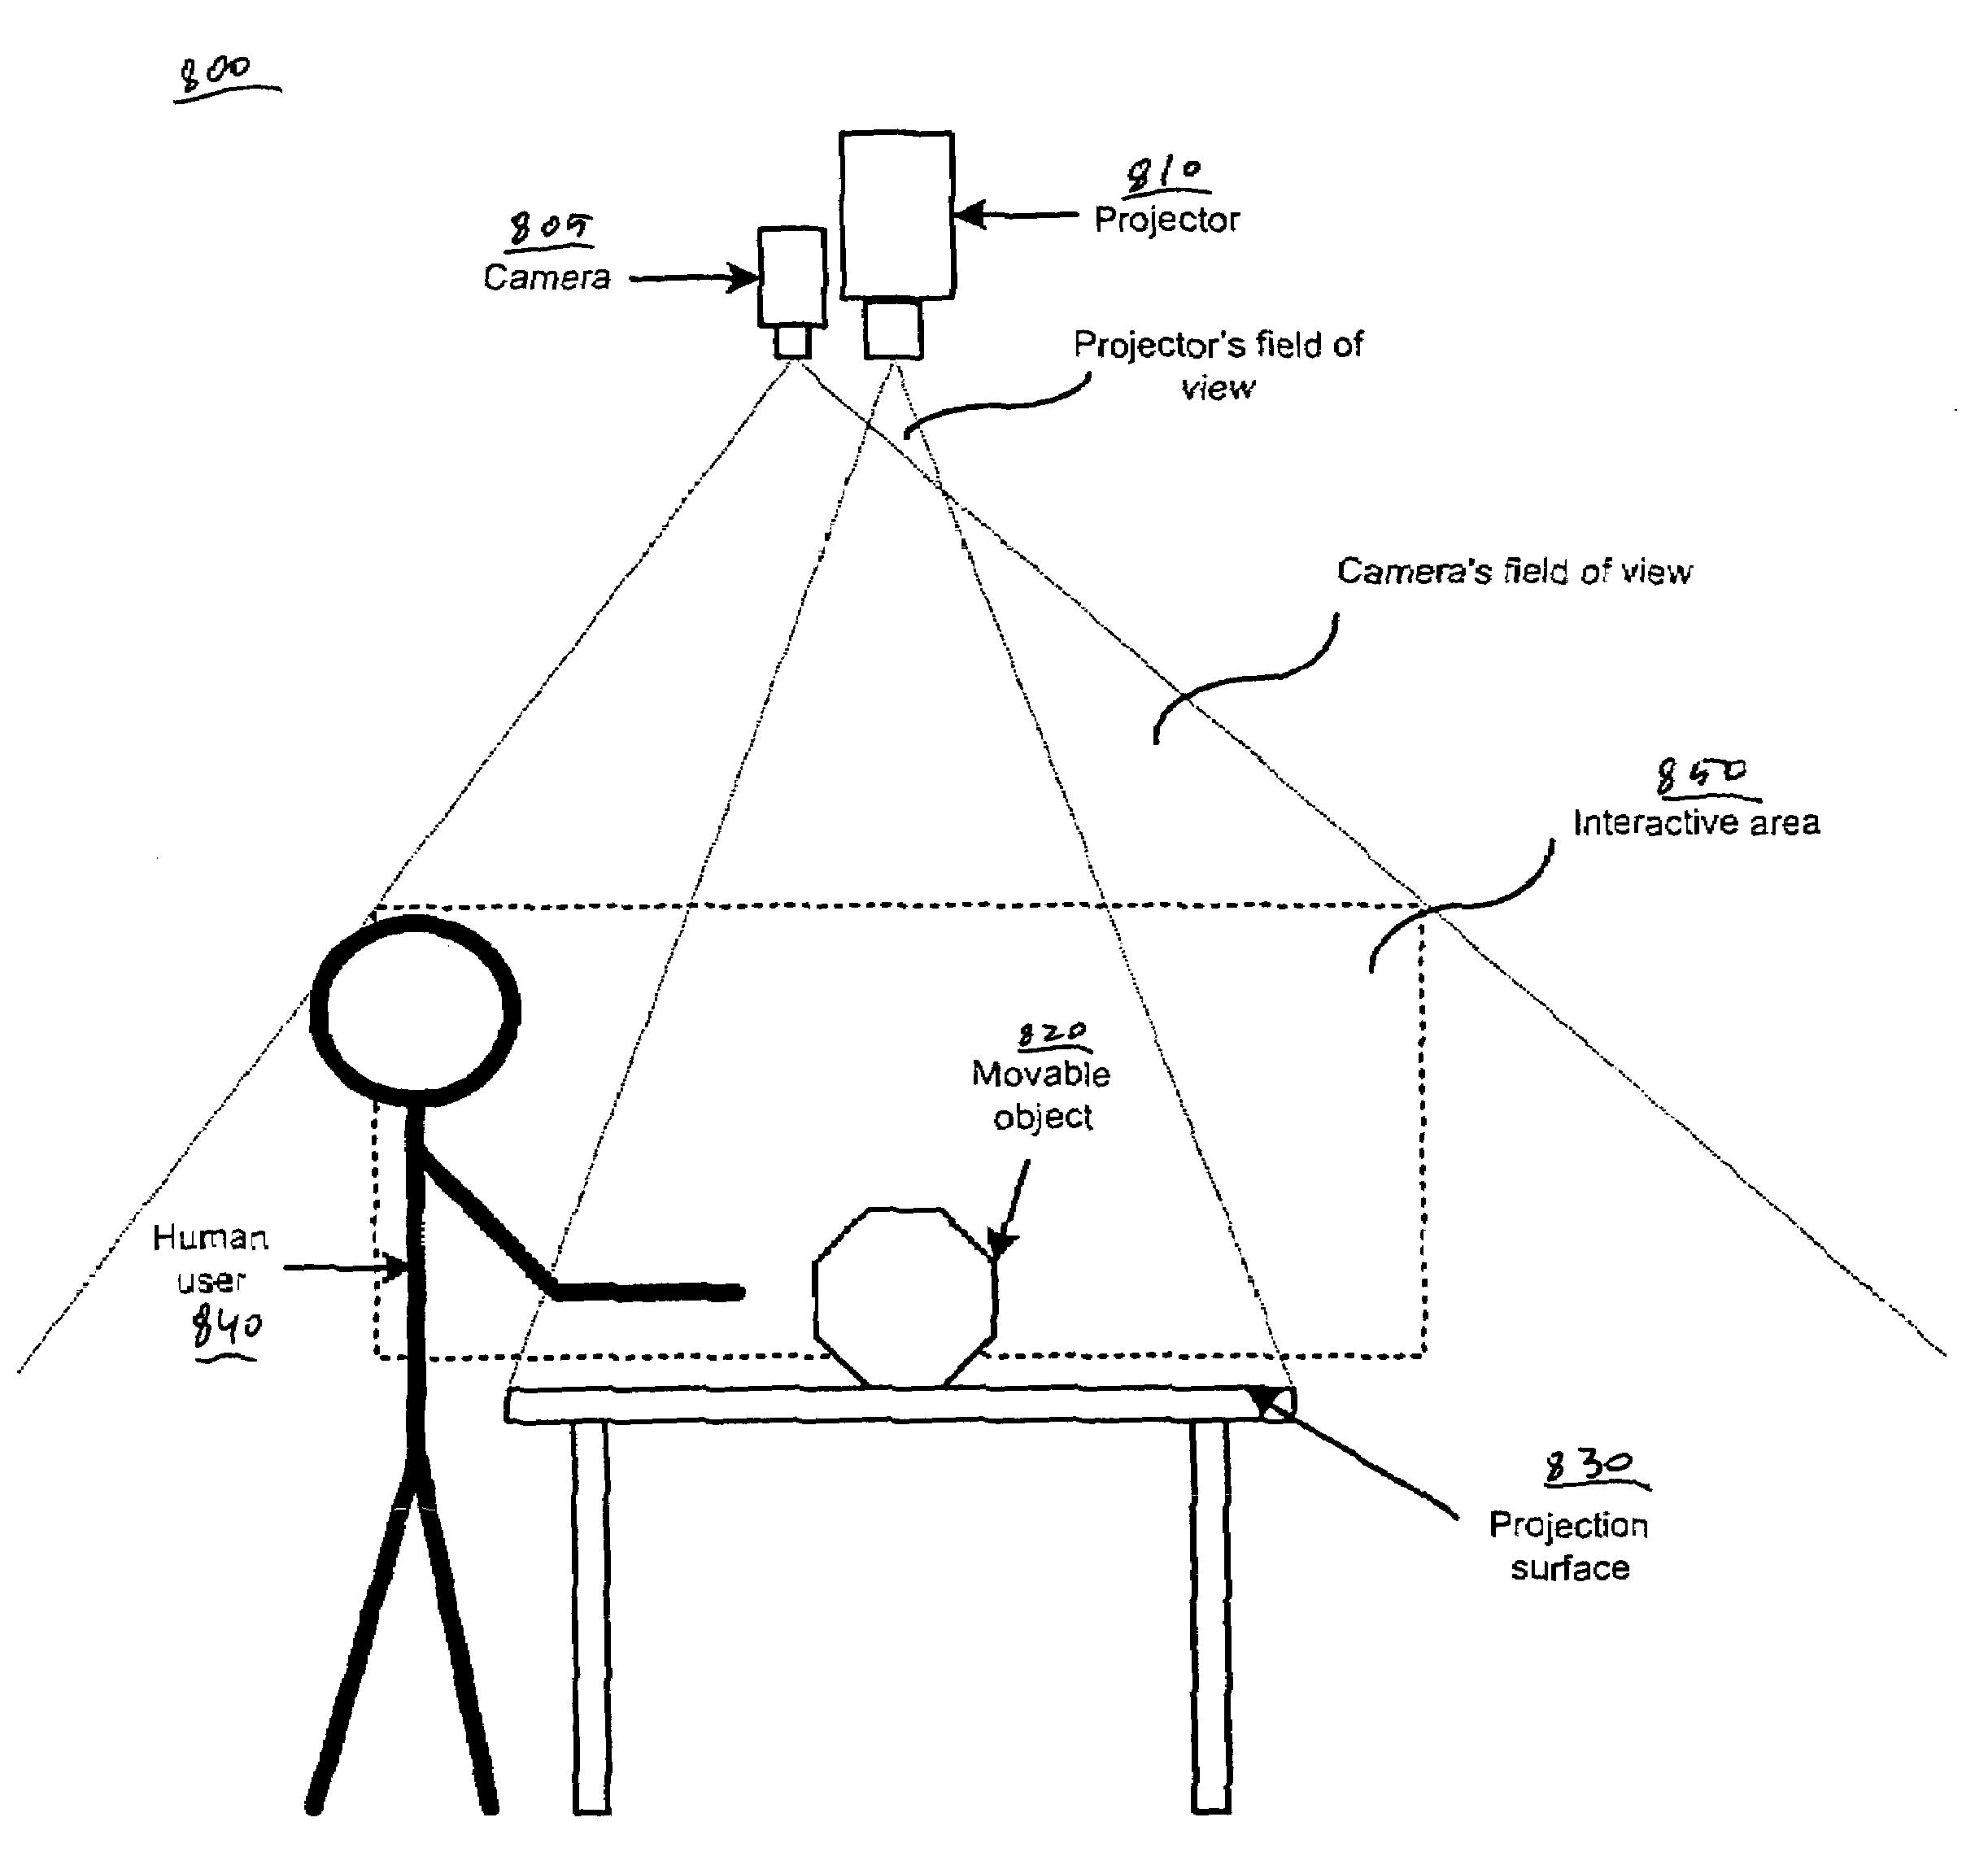 Structured Wiring Systems Definition Including Patent Us8587773 Arduinocircuitsimulator Arduinosimulator Us7348963 Interactive Video Display System Google Patentsuche Rh Ch